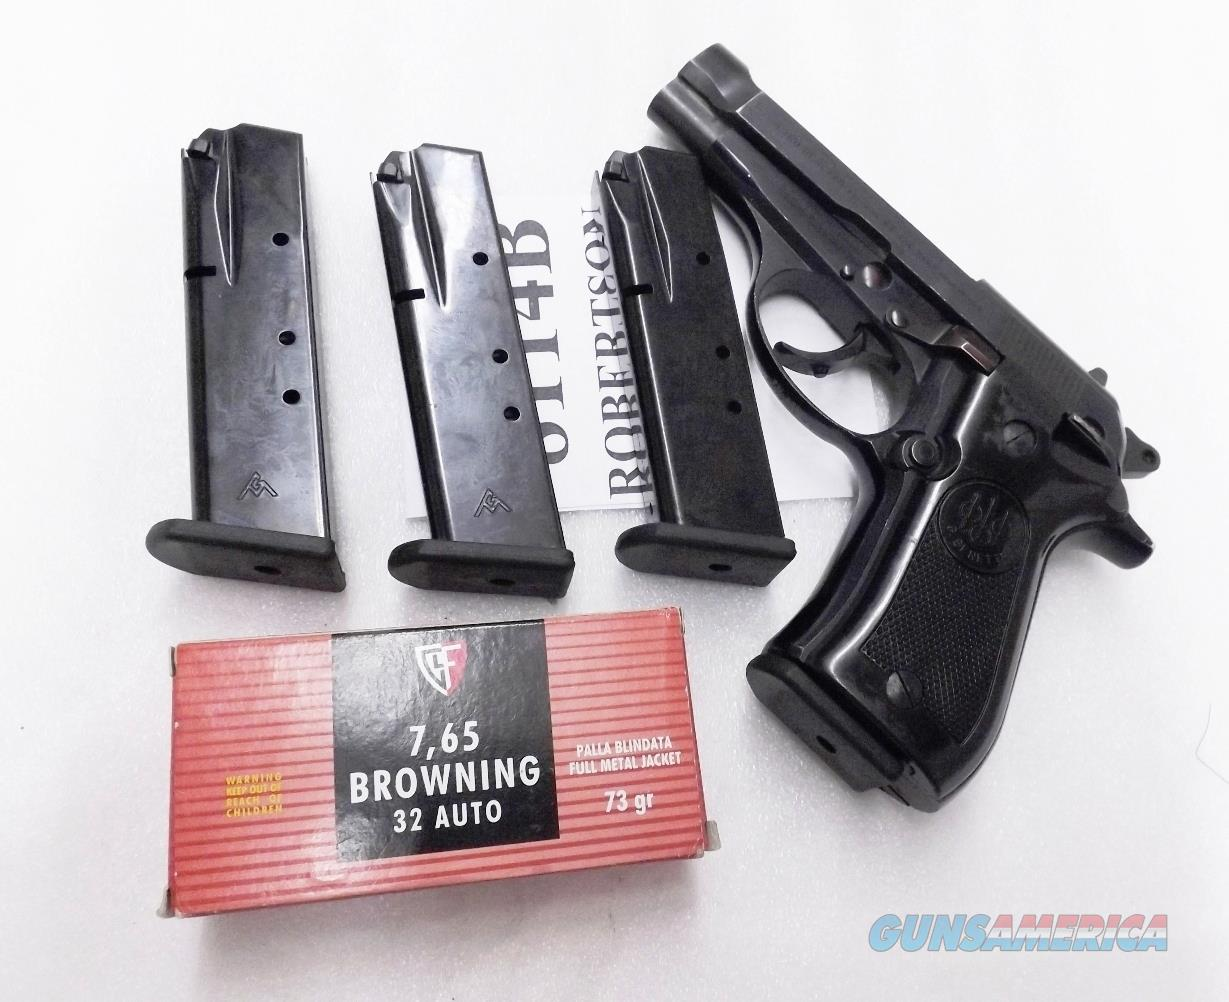 3 Beretta model 81 Cheetah .32 ACP Modified Mec-Gar 14 shot Magazines C85888 type $27 each Free Ship lower 48  Non-Guns > Magazines & Clips > Pistol Magazines > Beretta